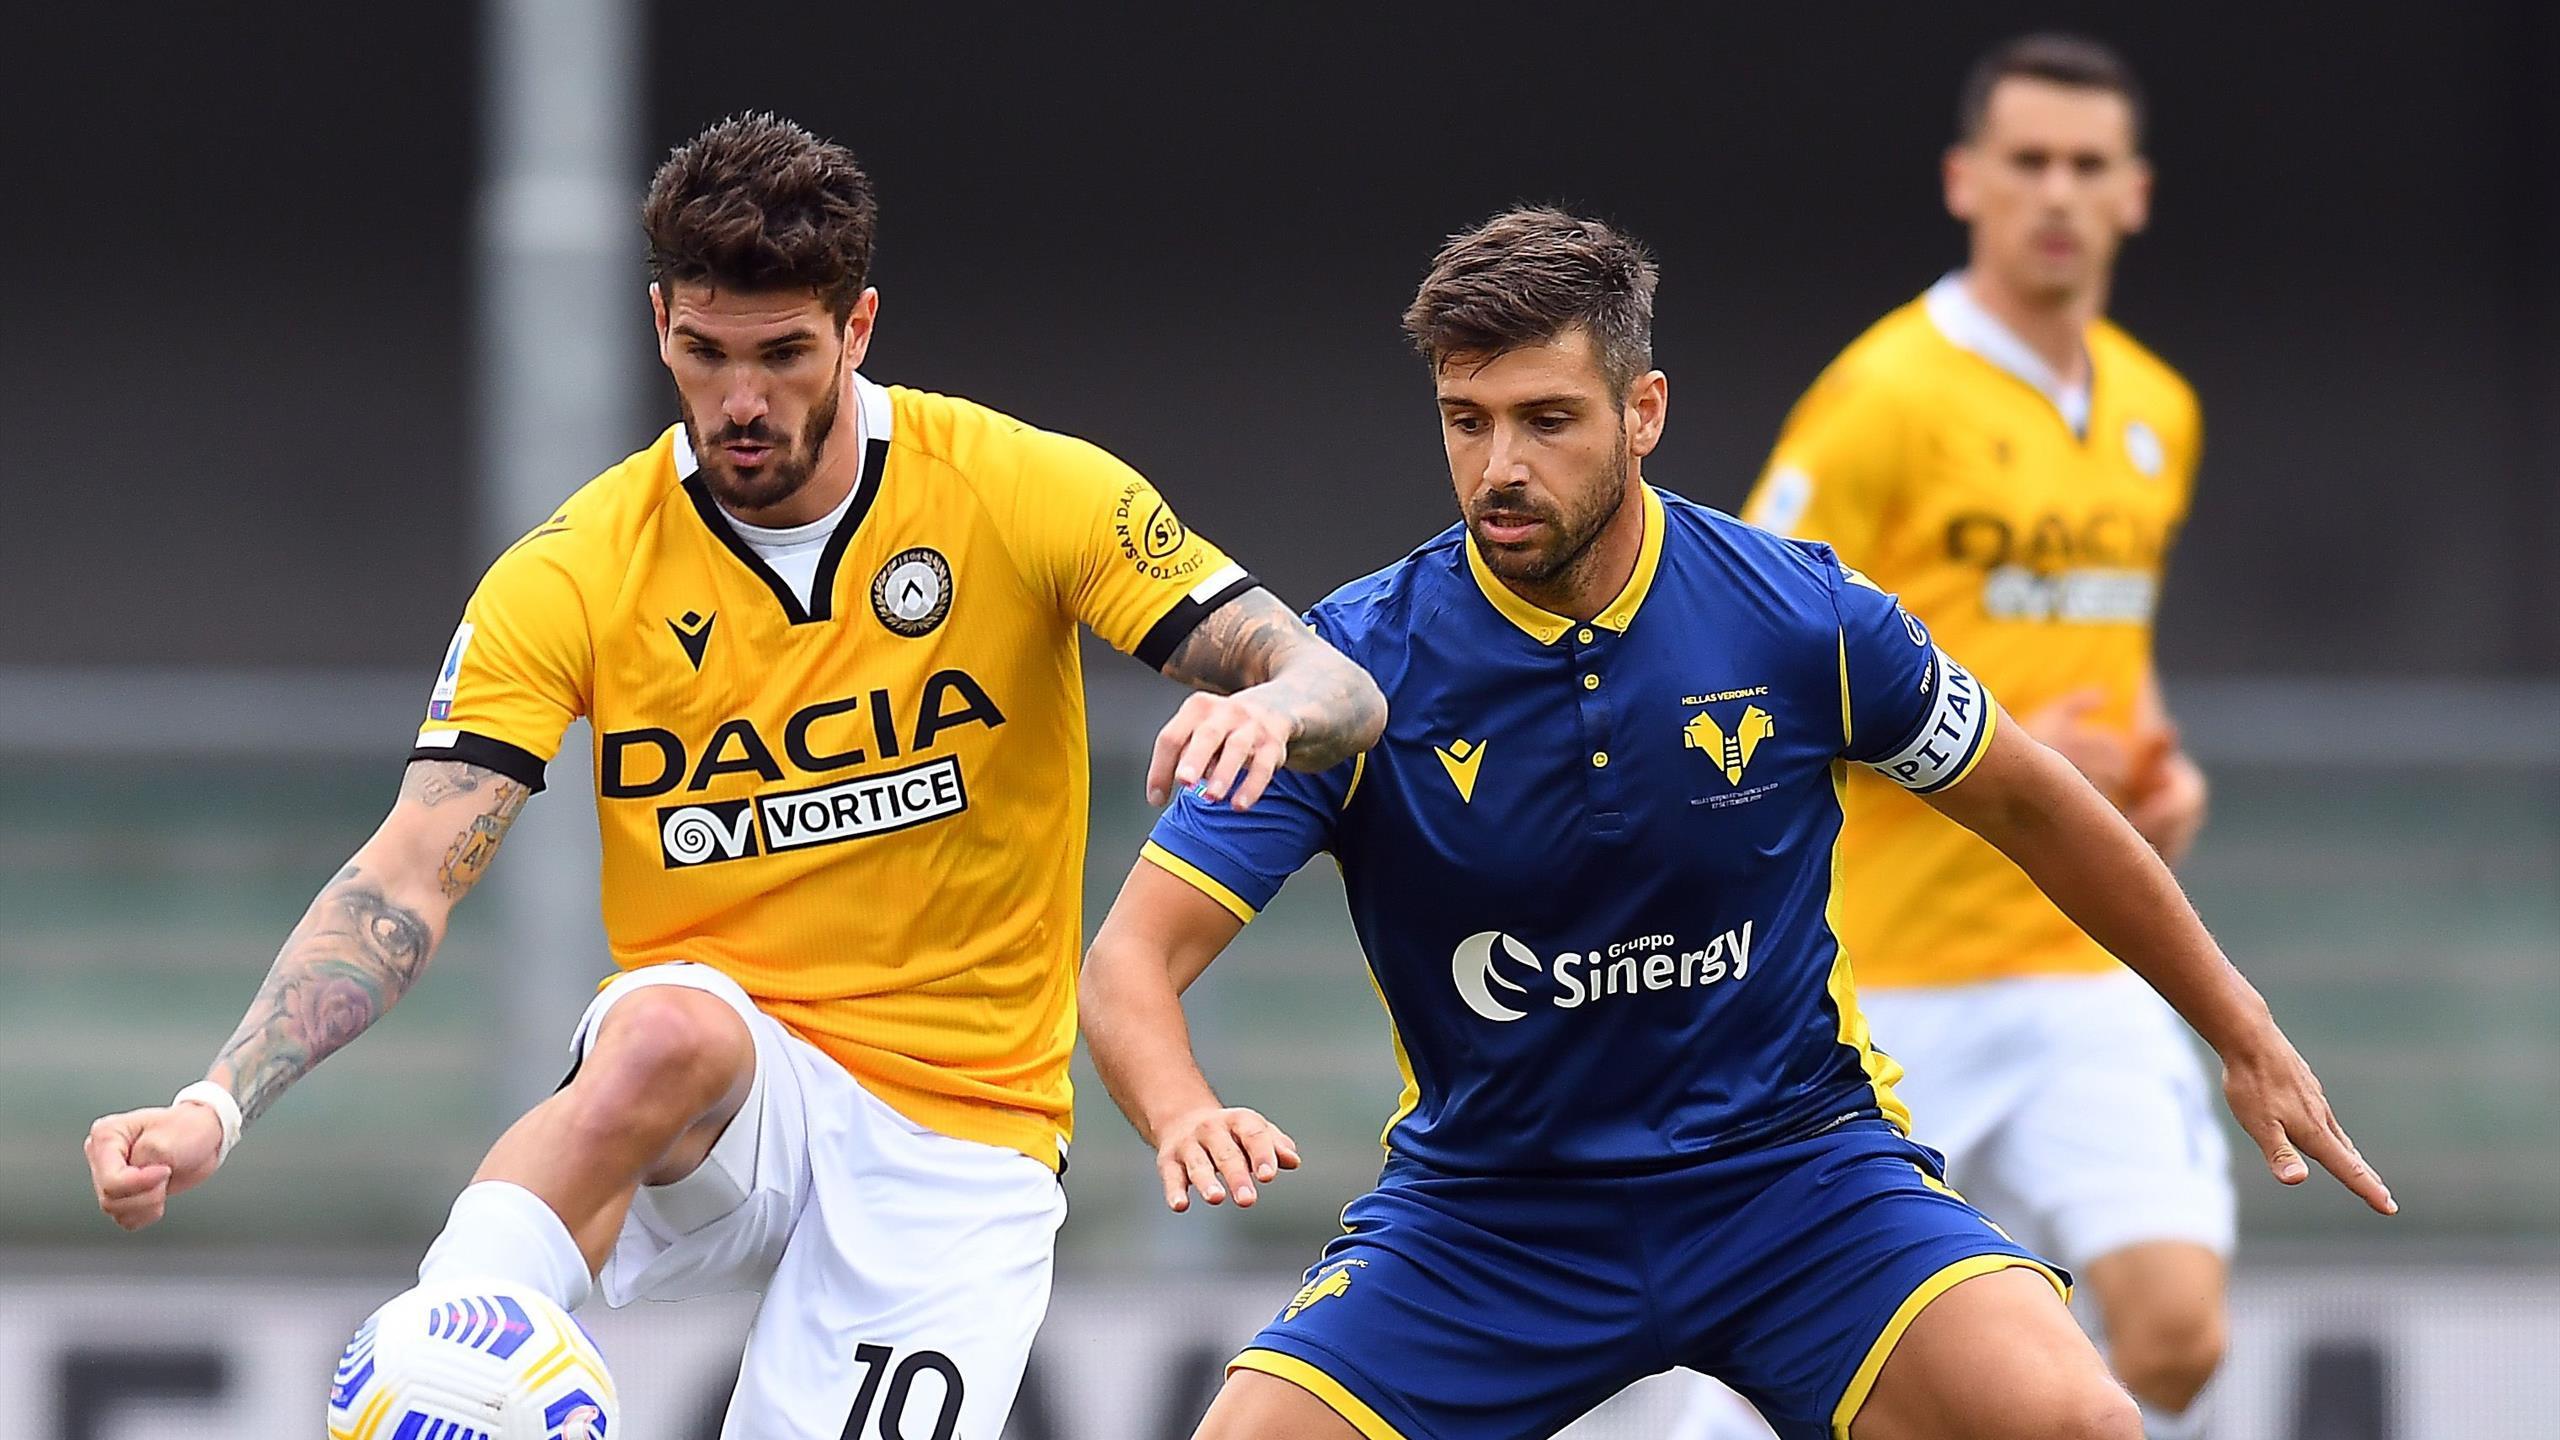 Le pagelle di Verona-Udinese 1-0 - Eurosport